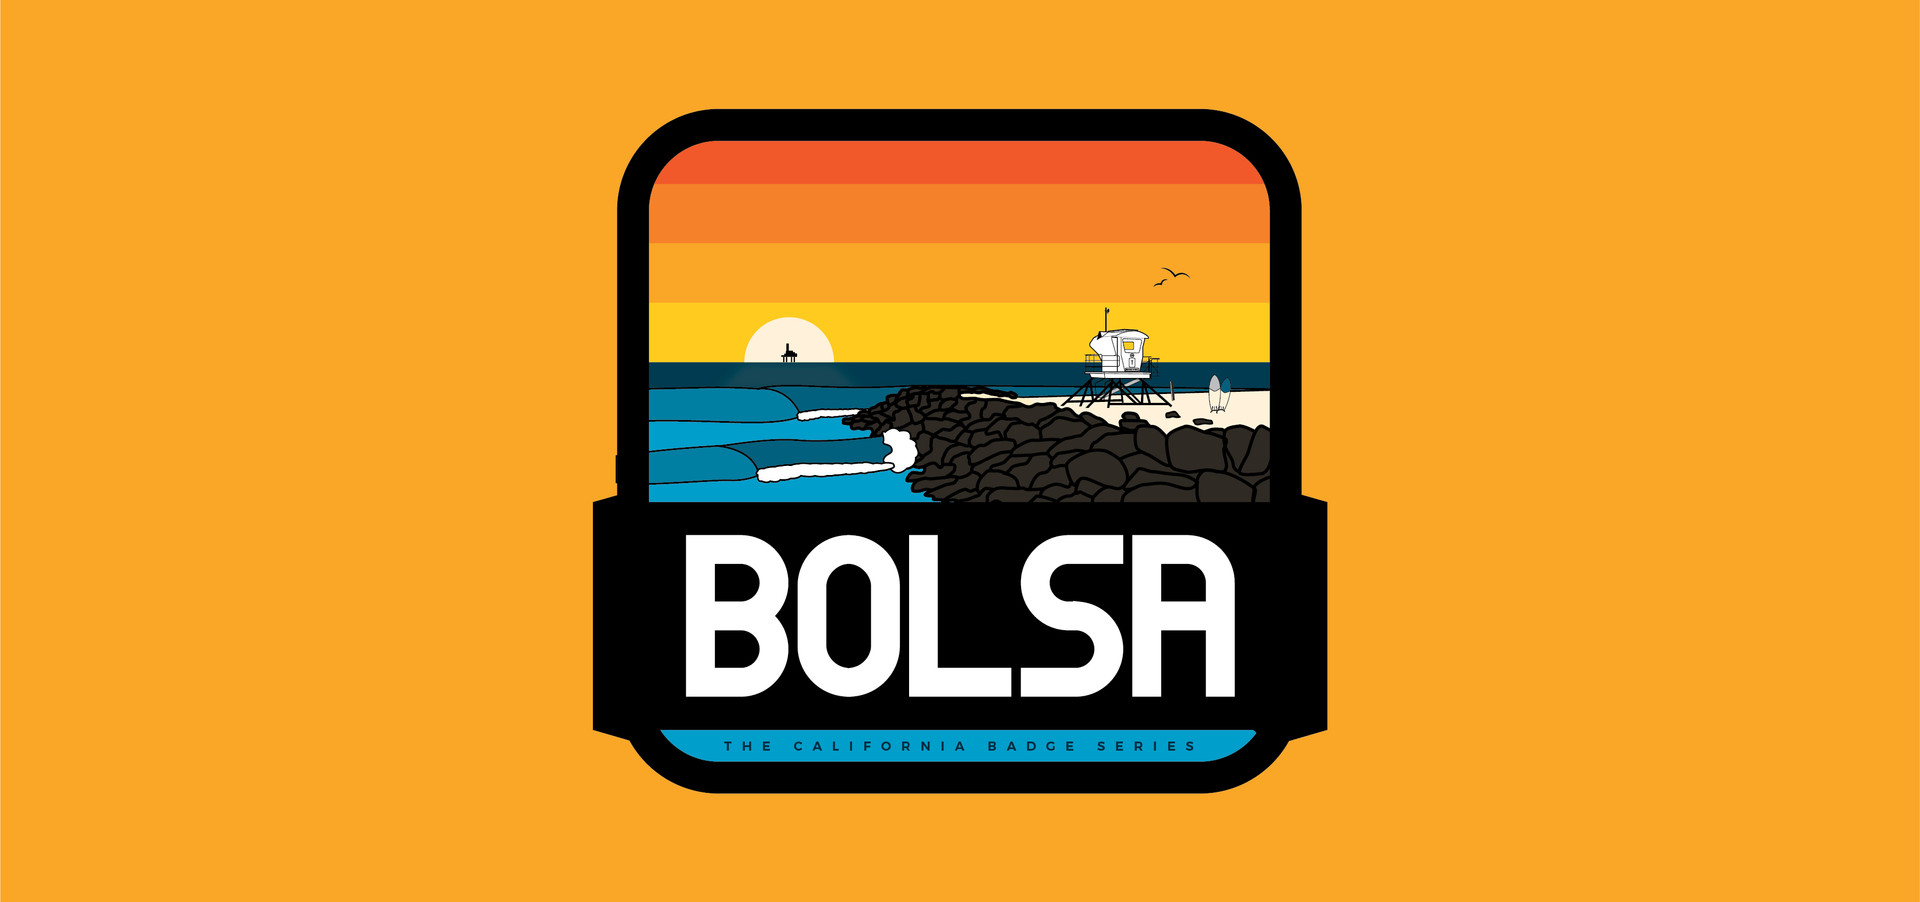 BOLSA-12.jpg